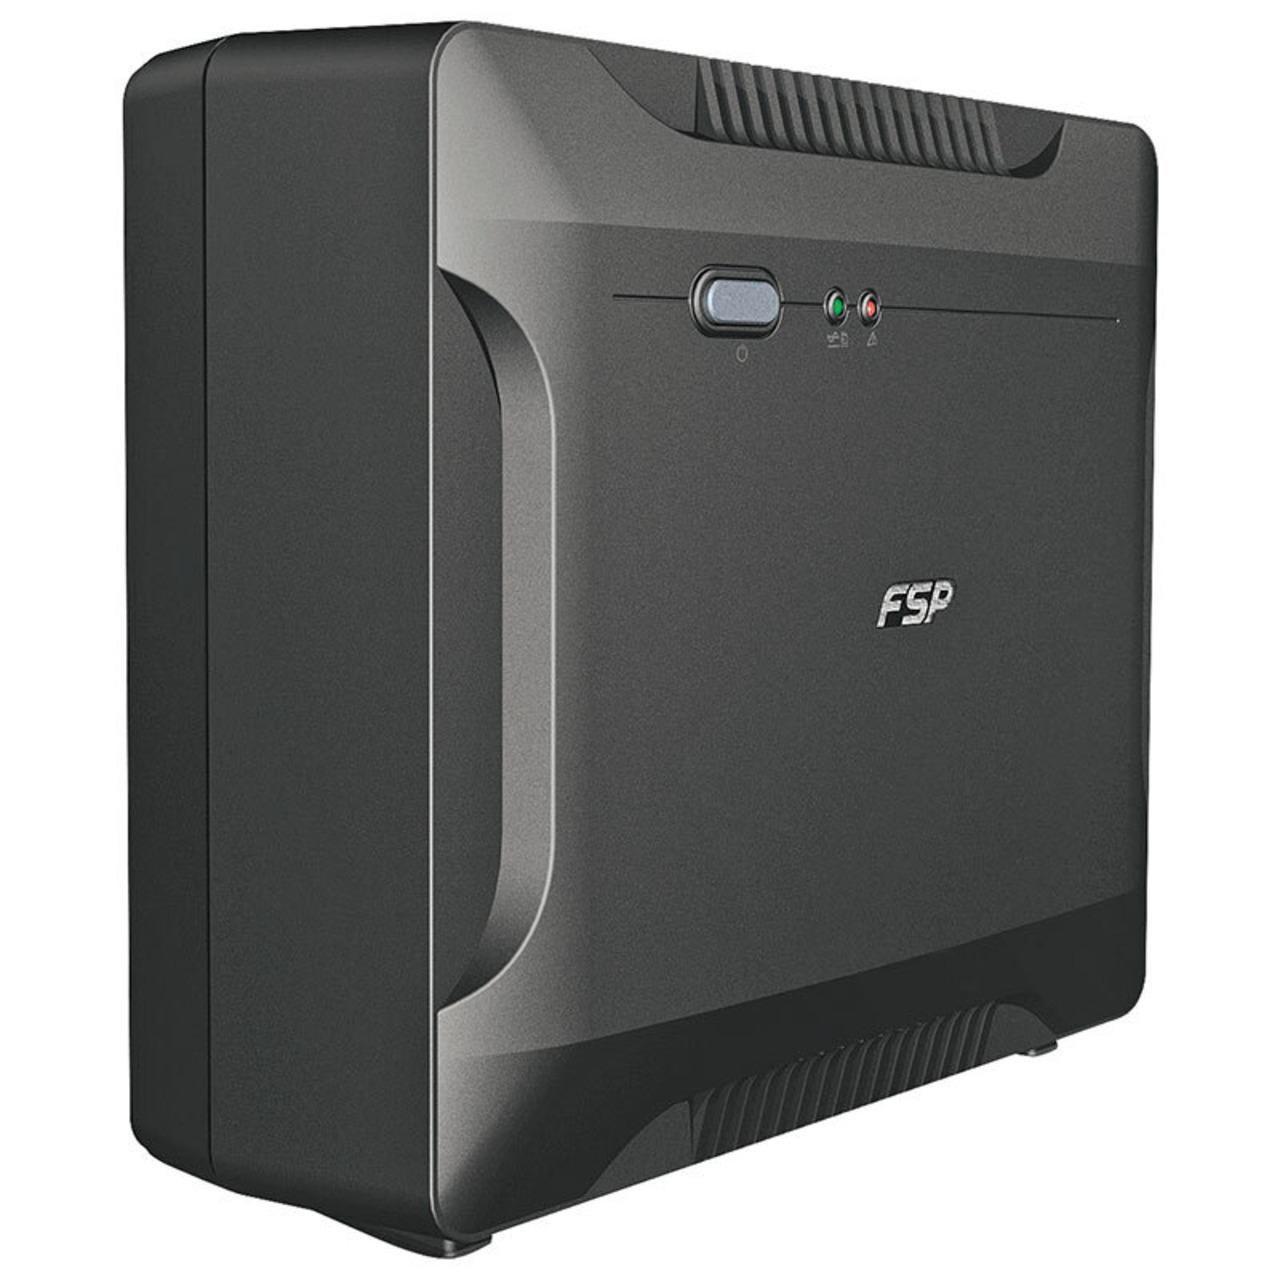 FSP Fortron USV-Anlage Nano 600- 600 VA